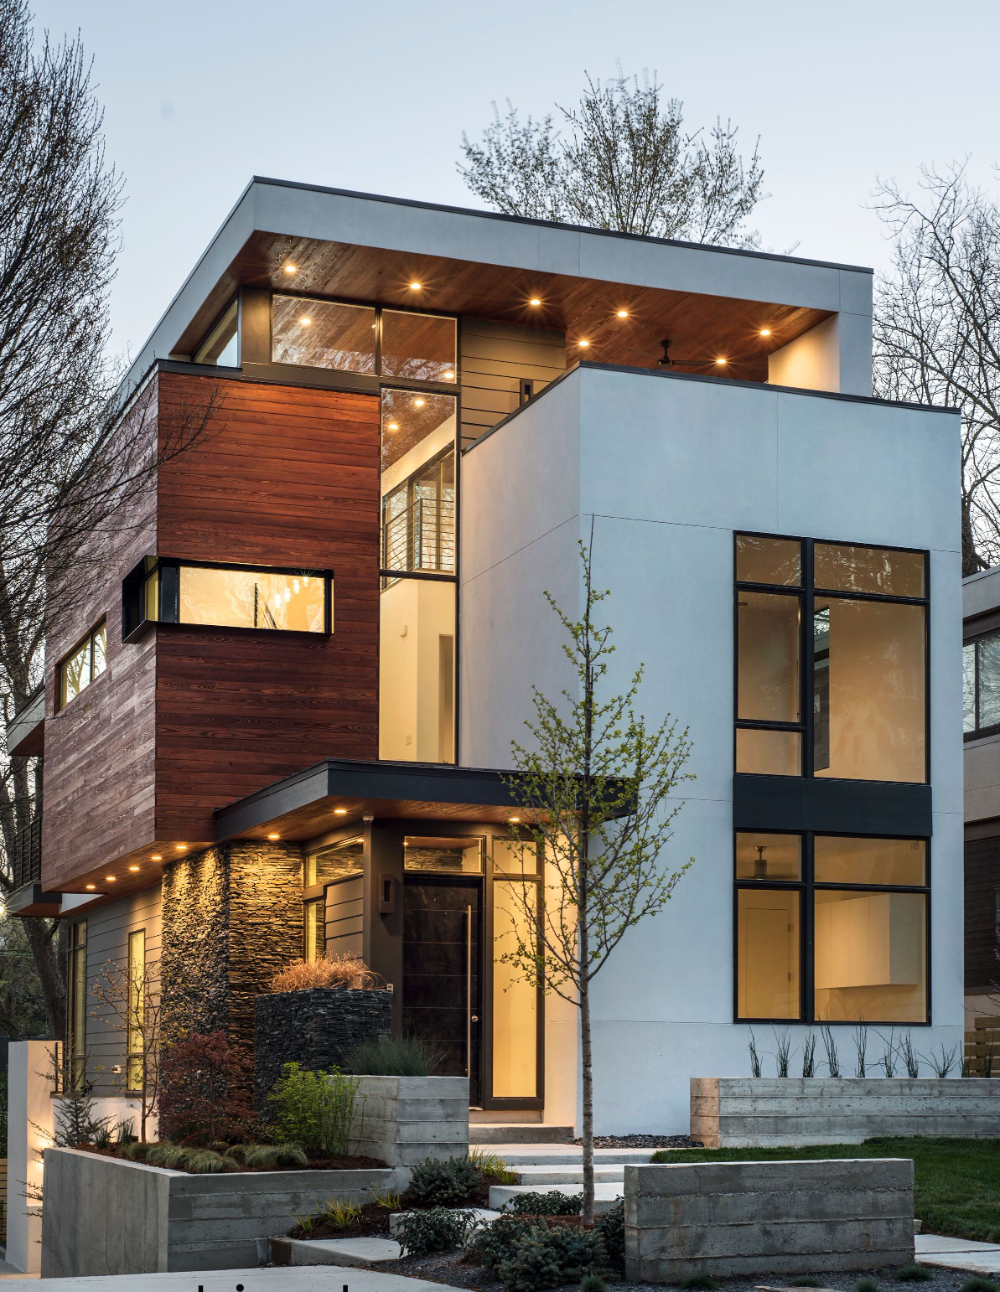 Sneak peek: 7 intriguing Atlanta moderns on upcoming MA! Architecture Tour